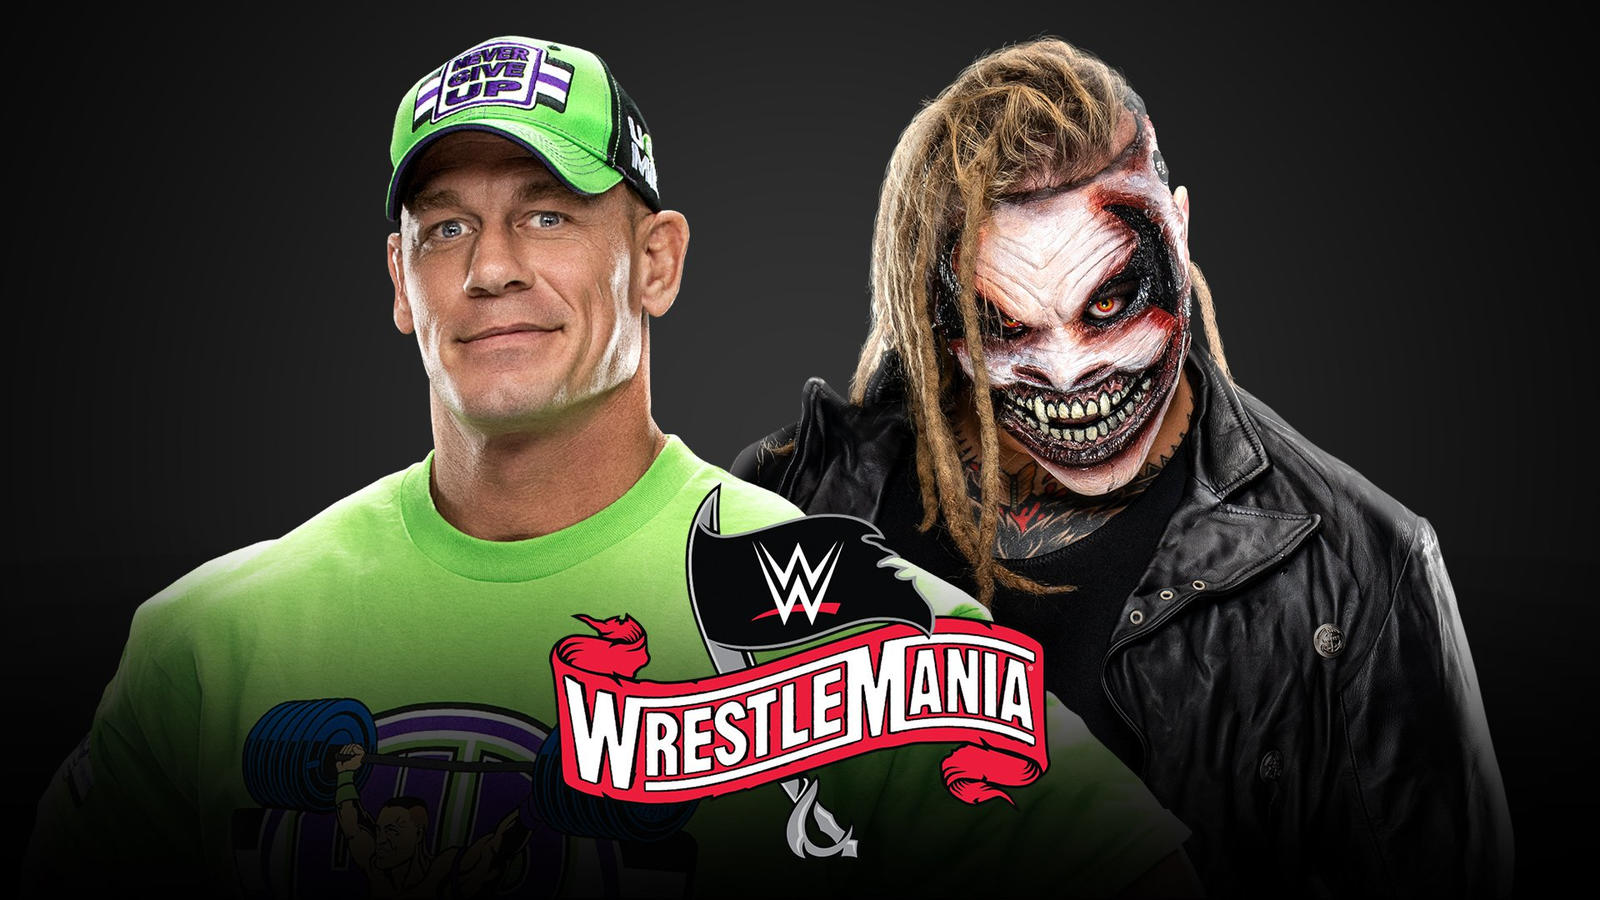 WWE Announces Goldberg Vs. Roman Reigns & John Cena Vs. The Fiend At Wrestlemania 36 3